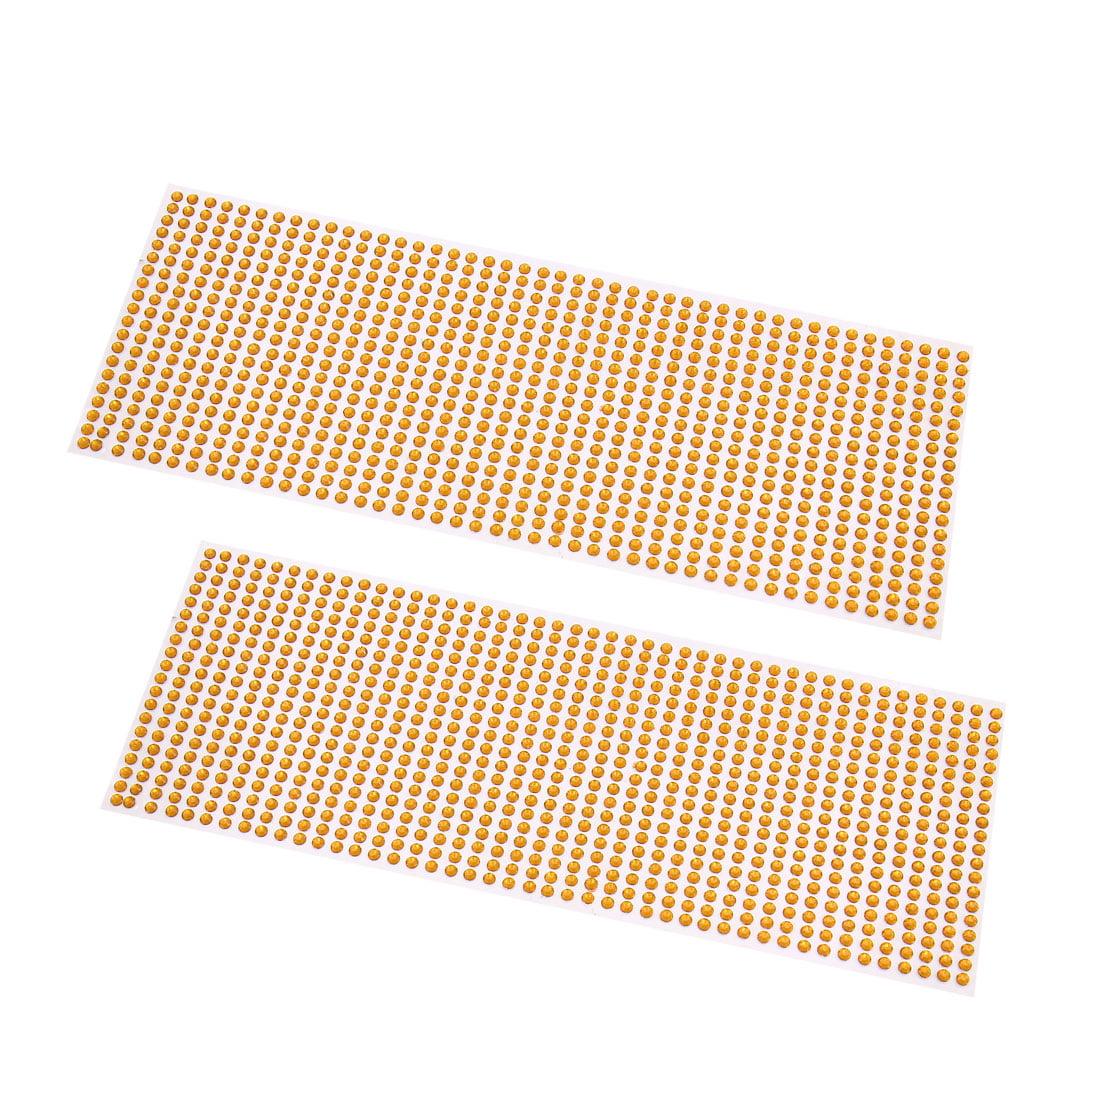 2Pcs Yellow 4mm Self Adhesive Bling Rhinestone DIY Car Phone Styling Sticker Decor Decal - image 1 de 1